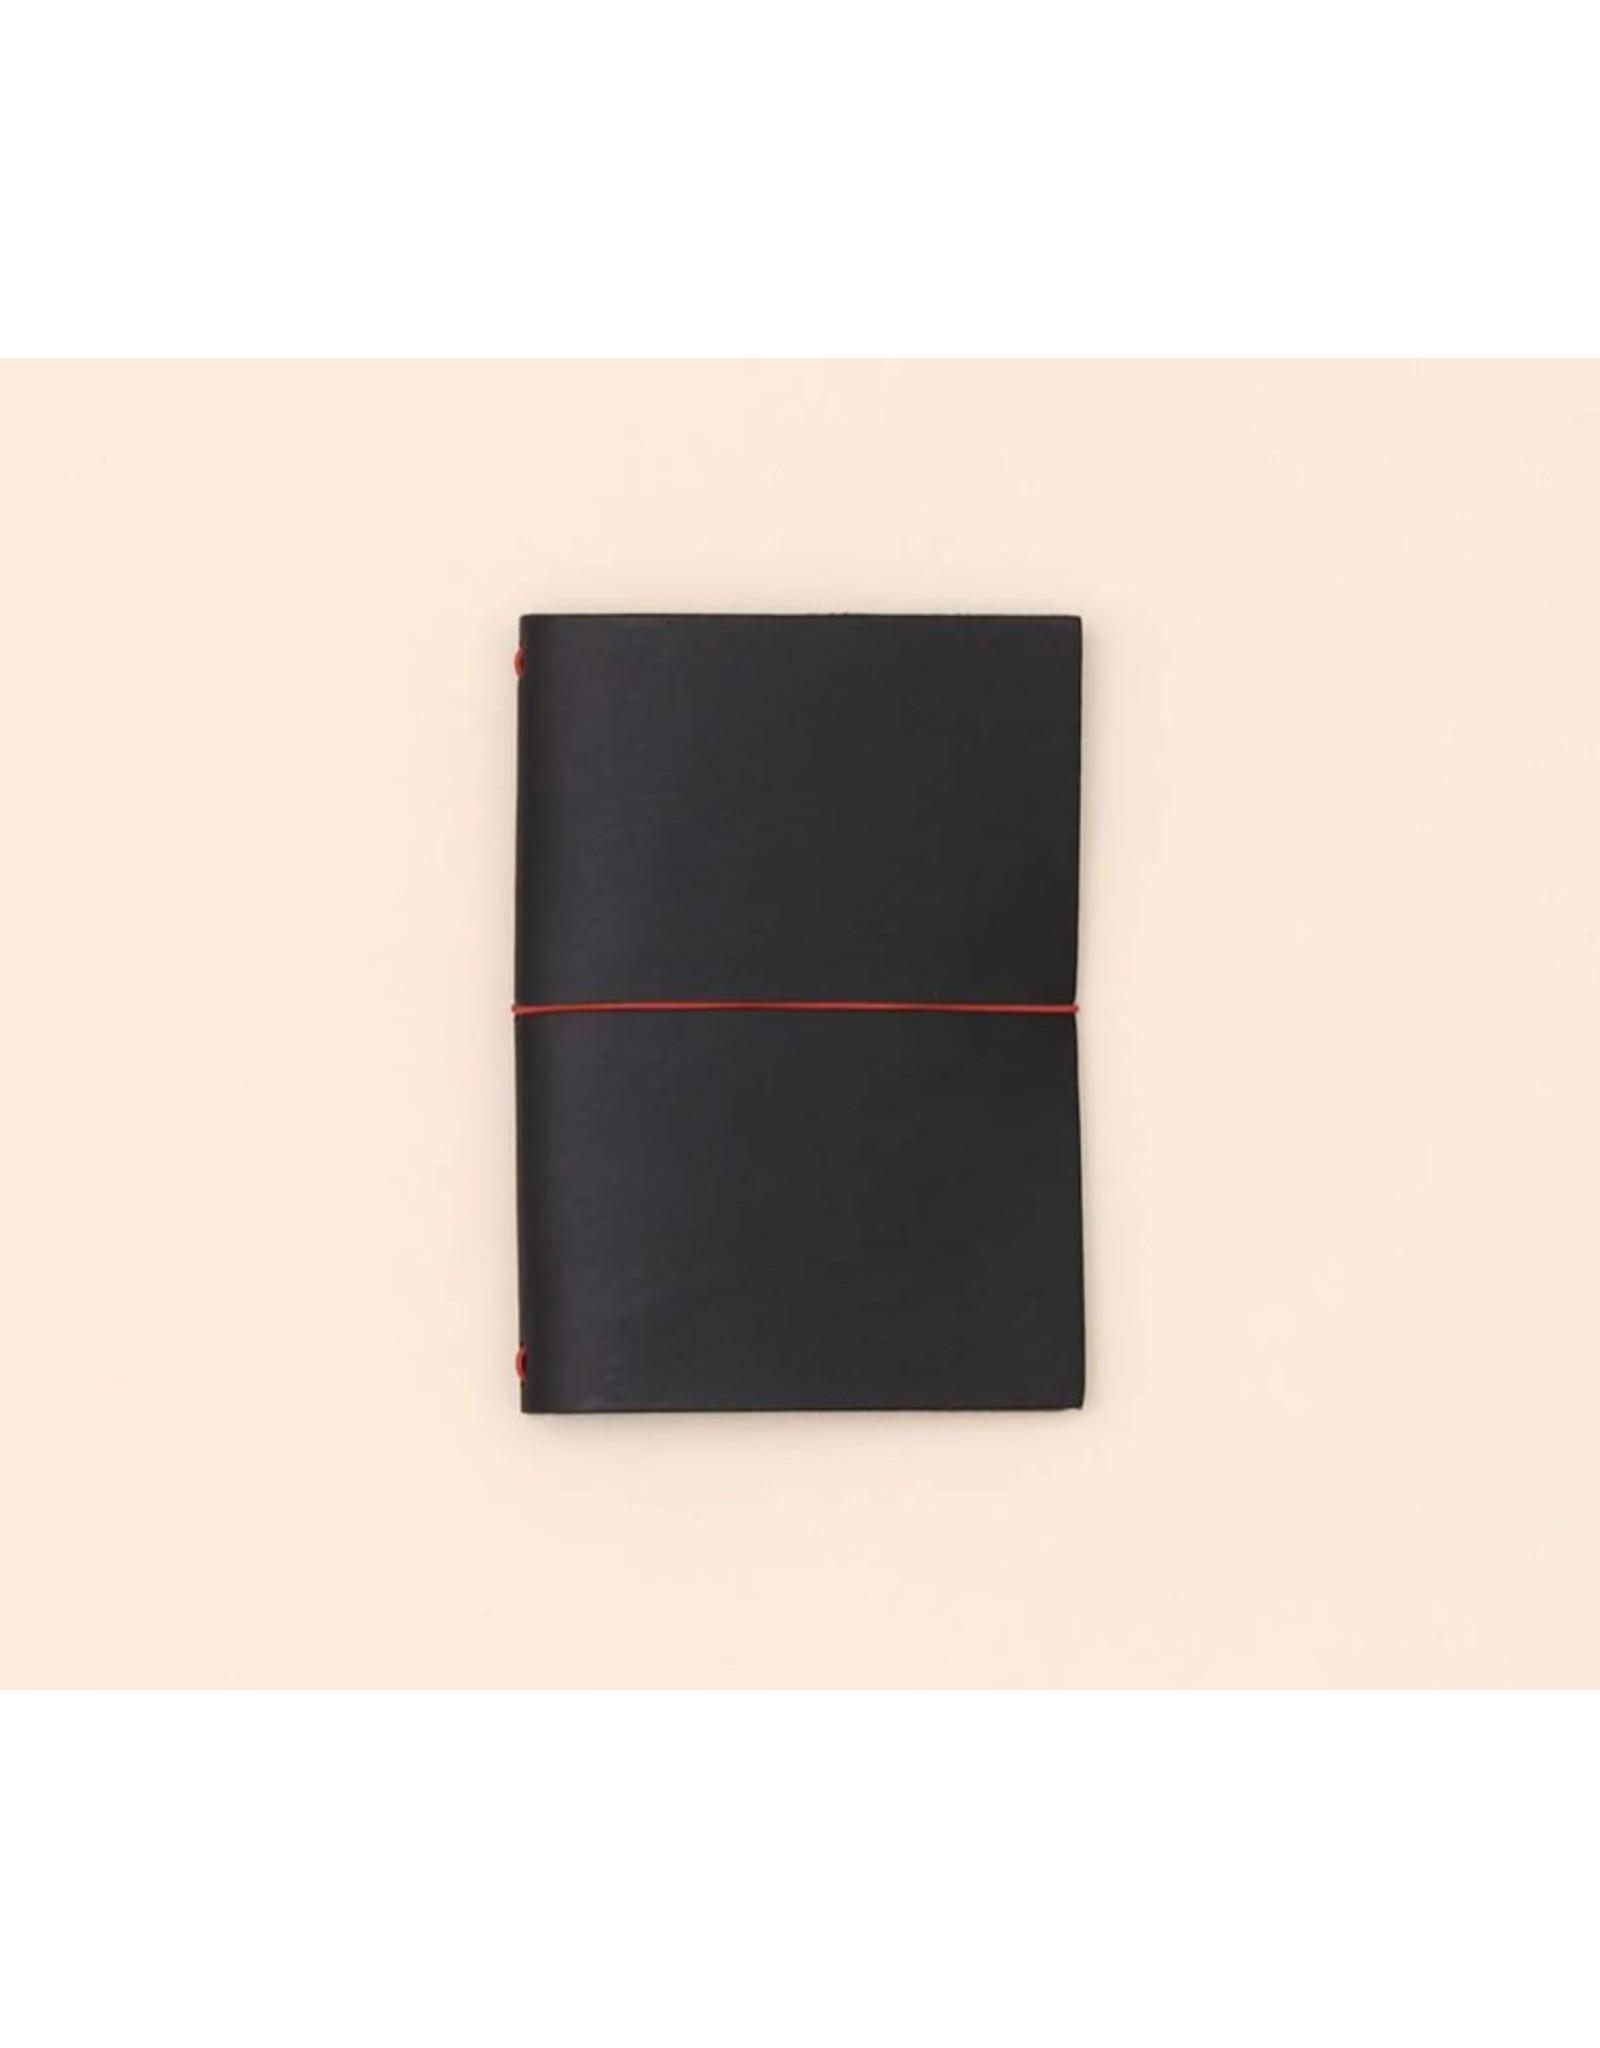 Paper republic Leather journal GSM  - Black -  8 x 15 -  with notebook 7 x 14  - Oranje rekker